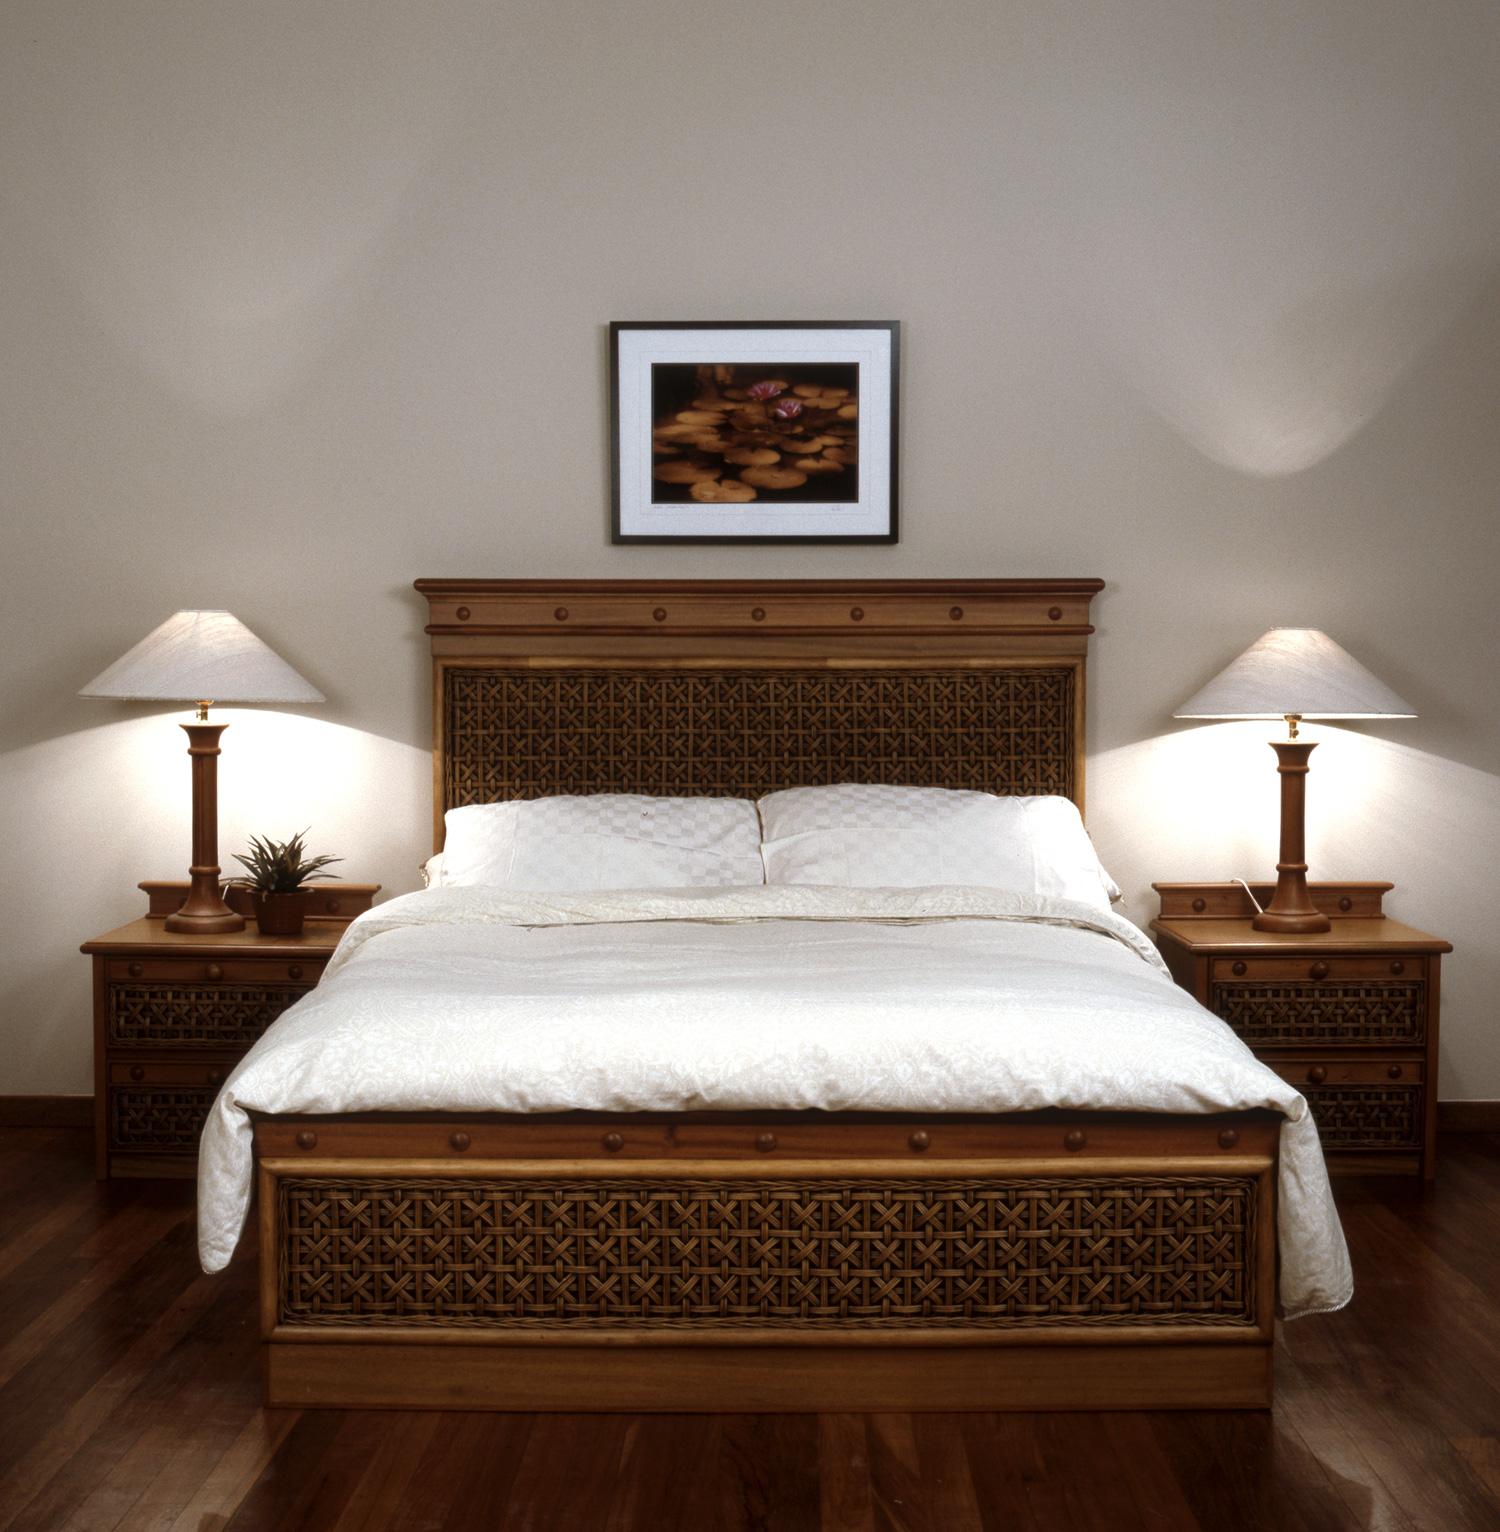 wicker and rattan bedroom furniture